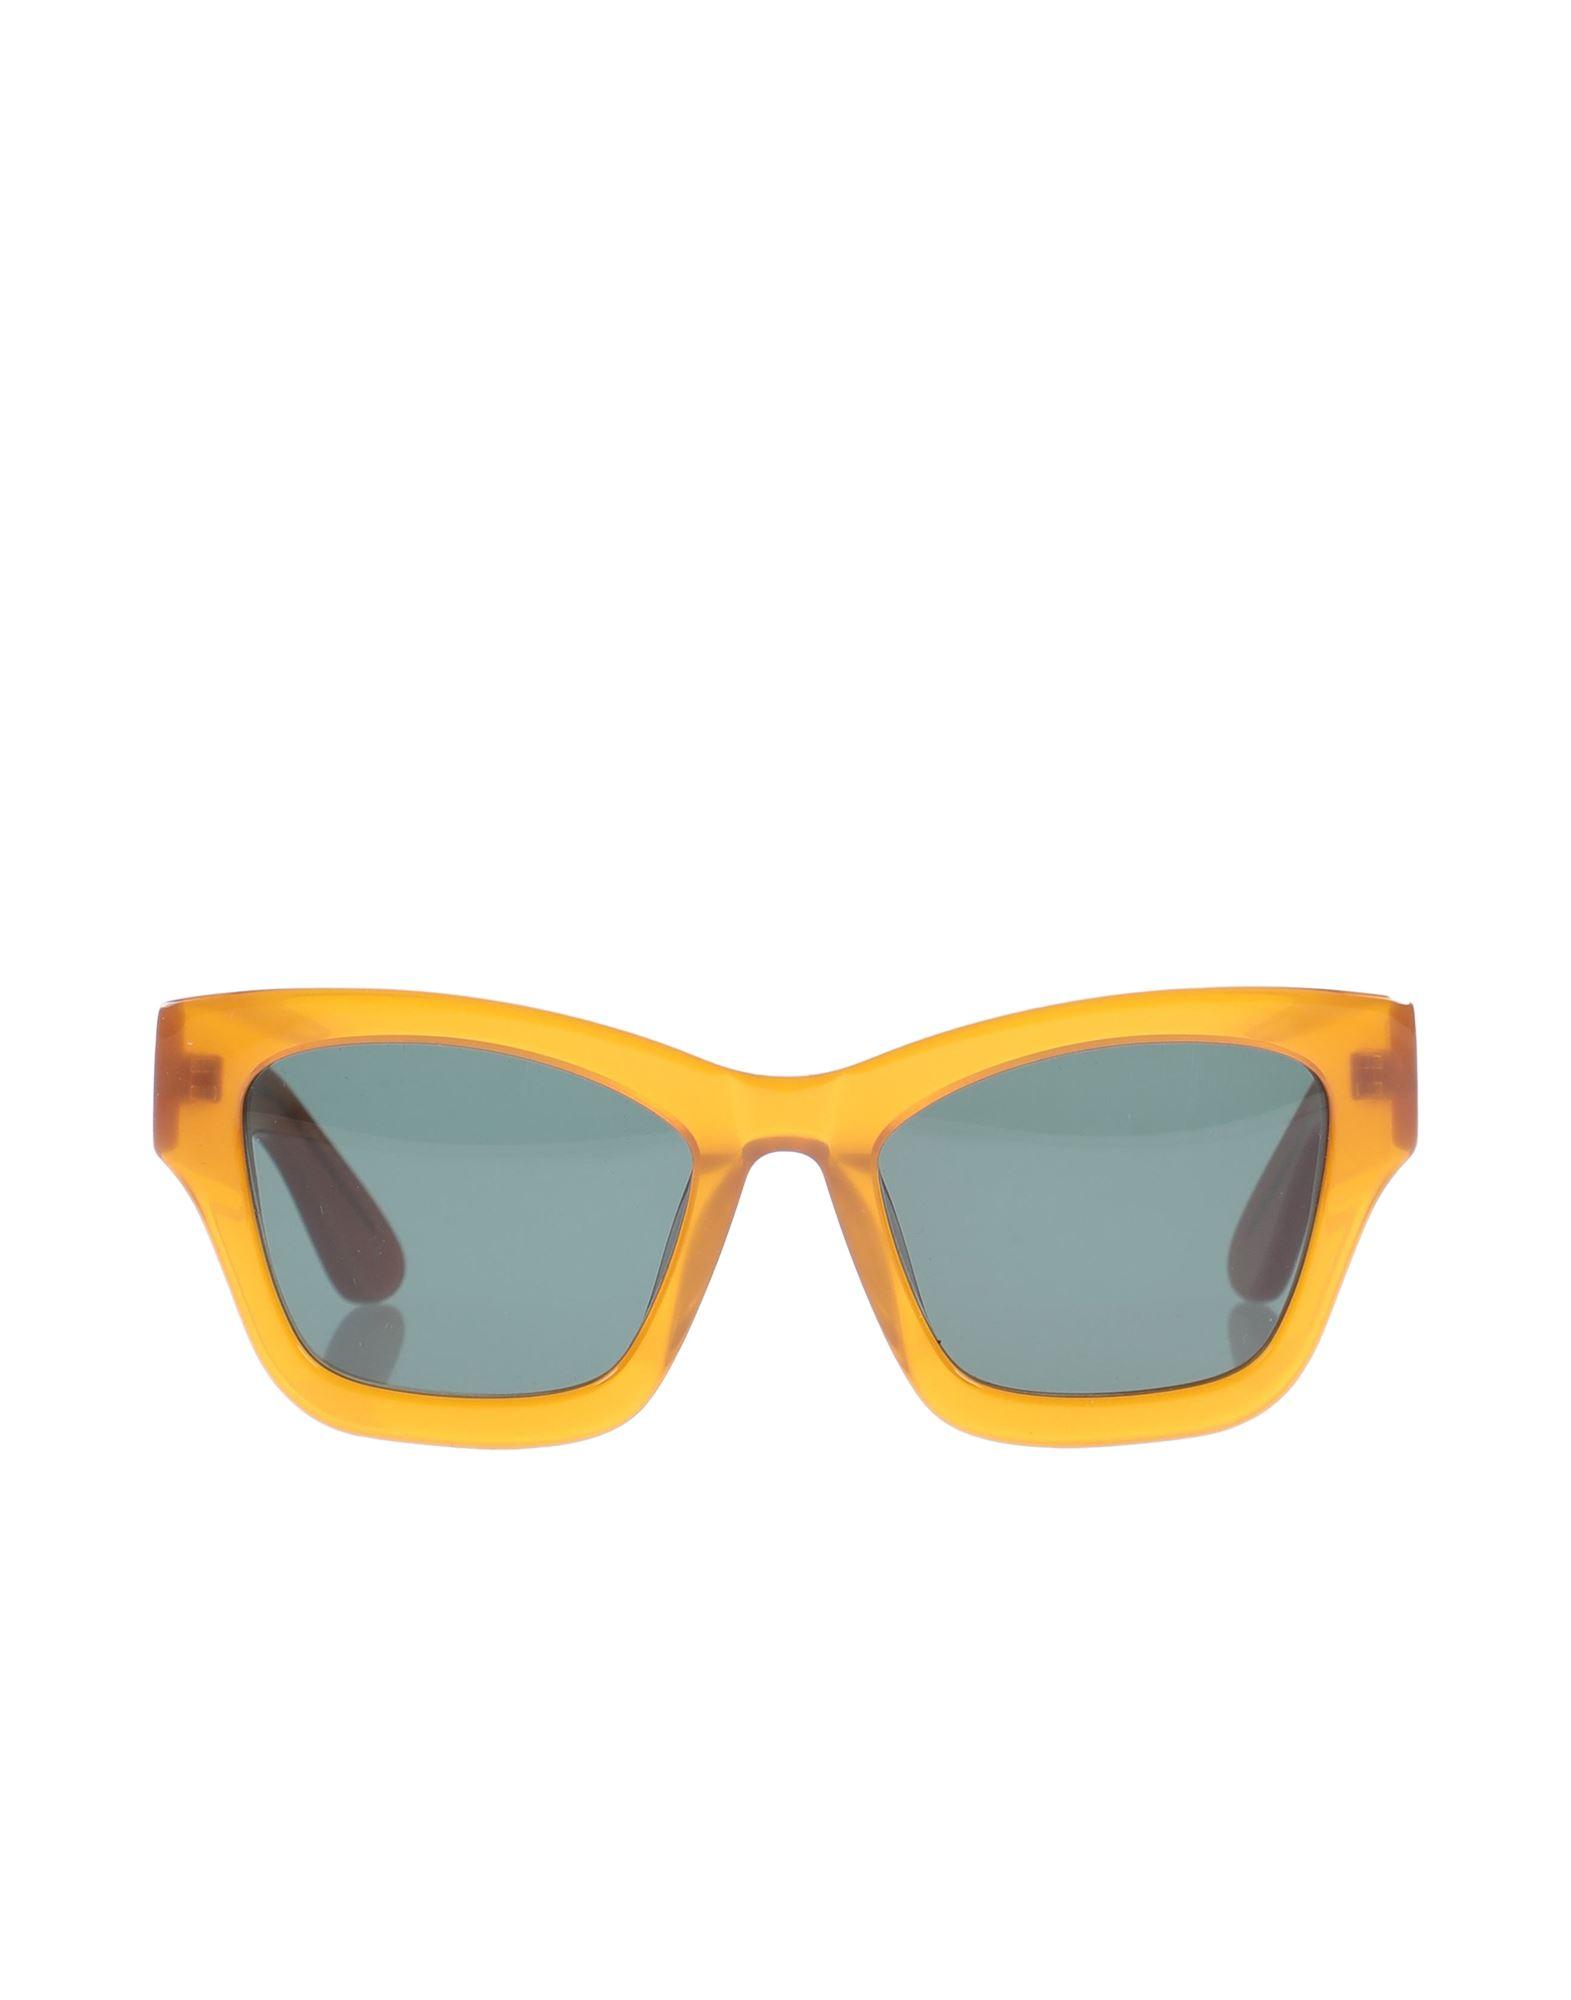 HAN KJØBENHAVN Sunglasses - Item 46745069